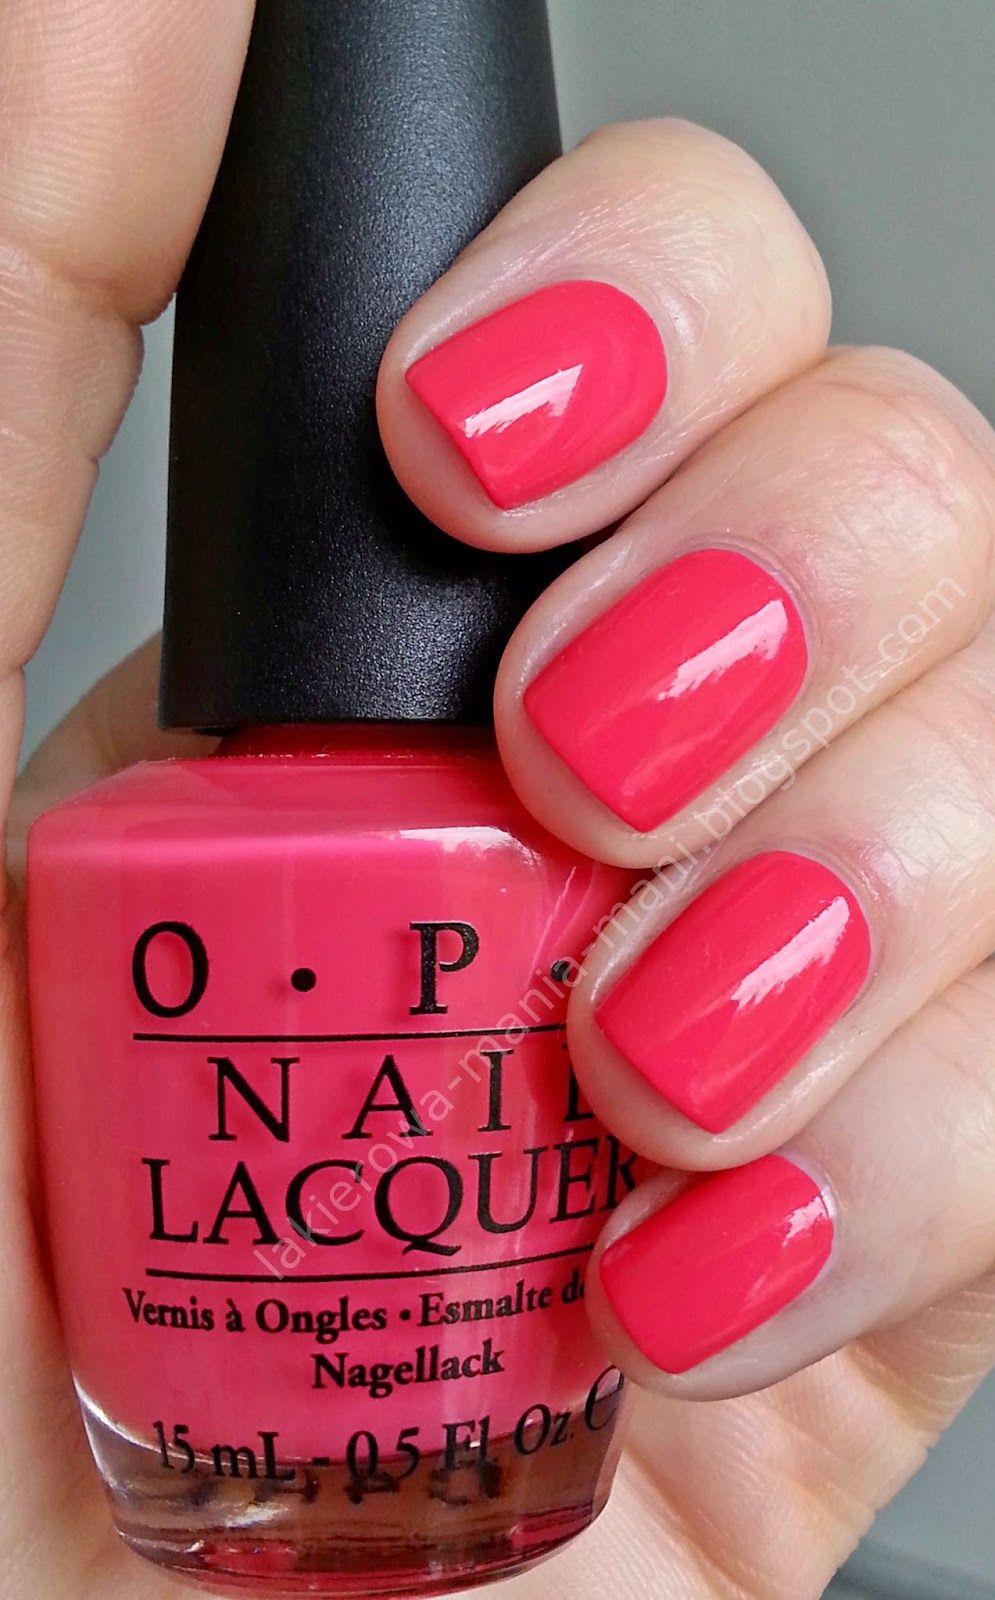 Opi Charged Up Cherry Nails Gelish Nails Opi Manicura